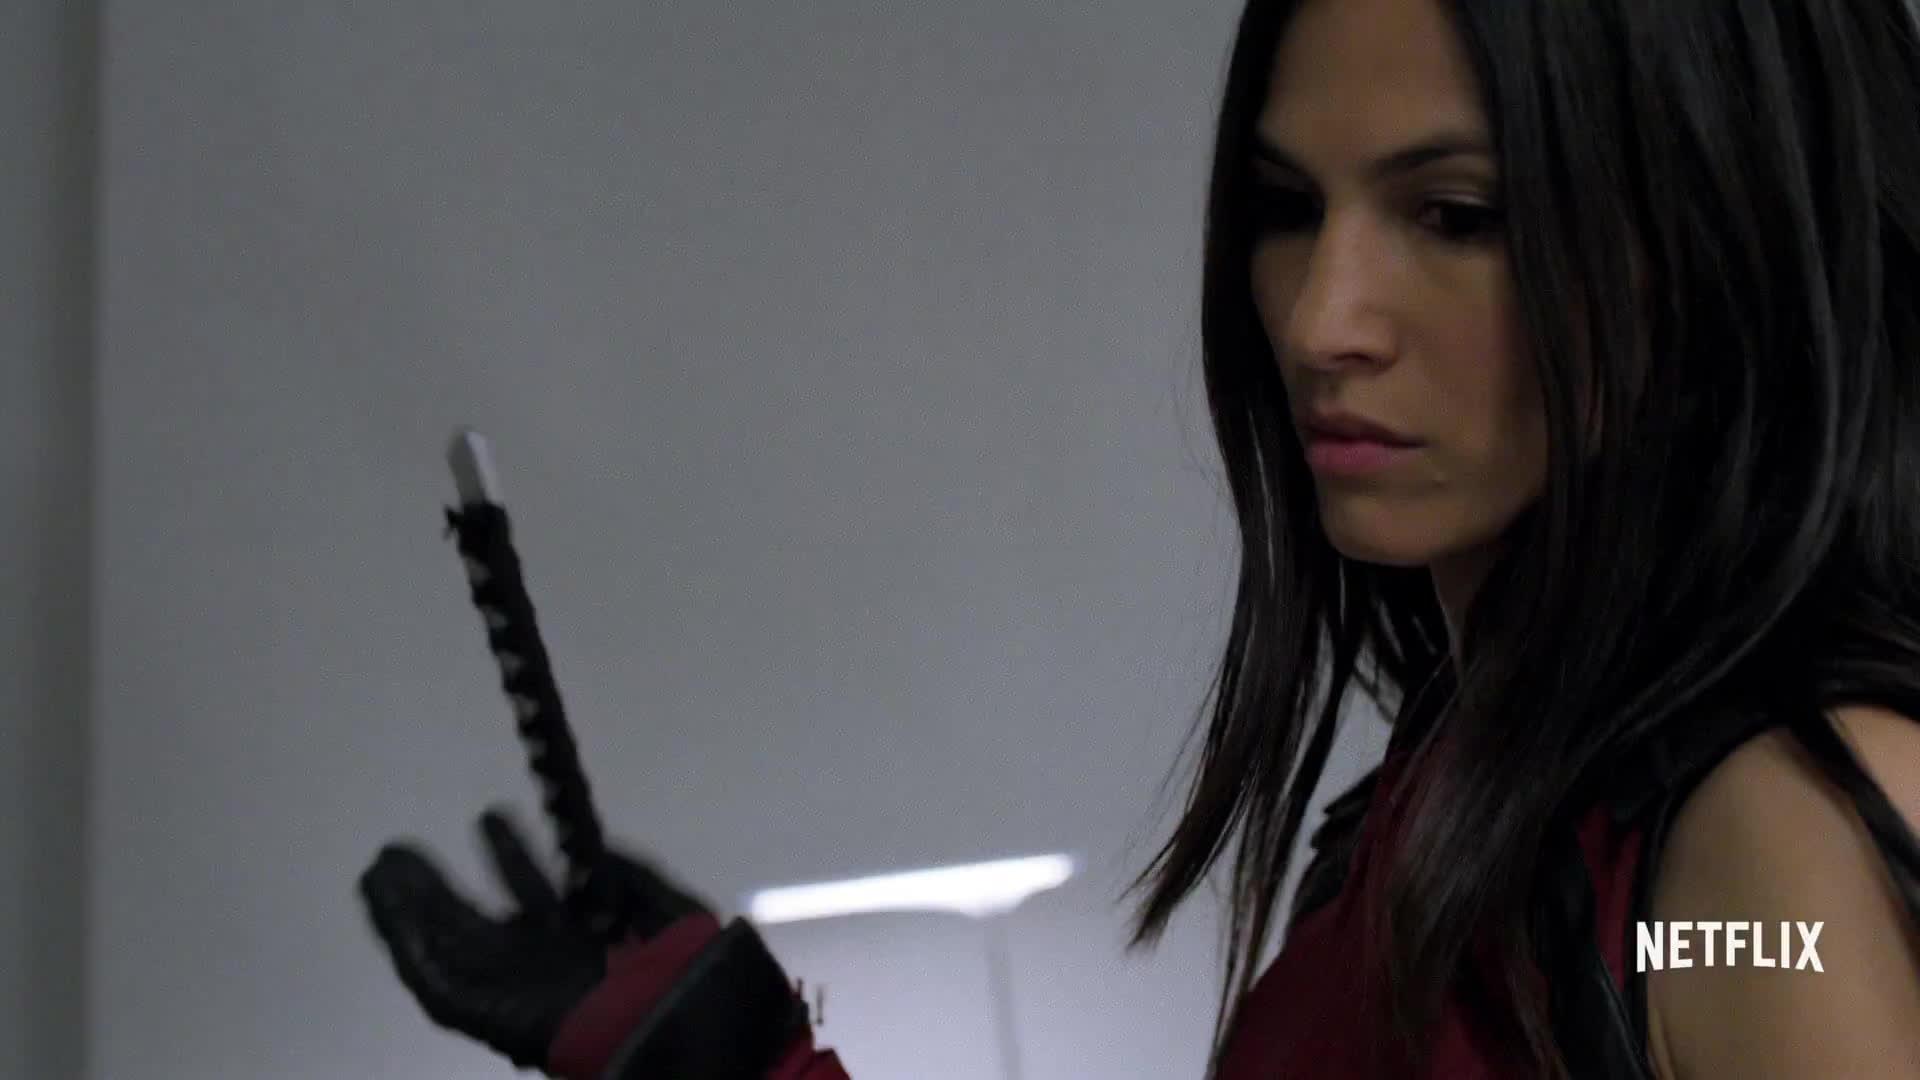 defenders, elektra, netflix, netflix original series, trailer, Marvel's The Defenders | Official Trailer | Netflix [HD] GIFs